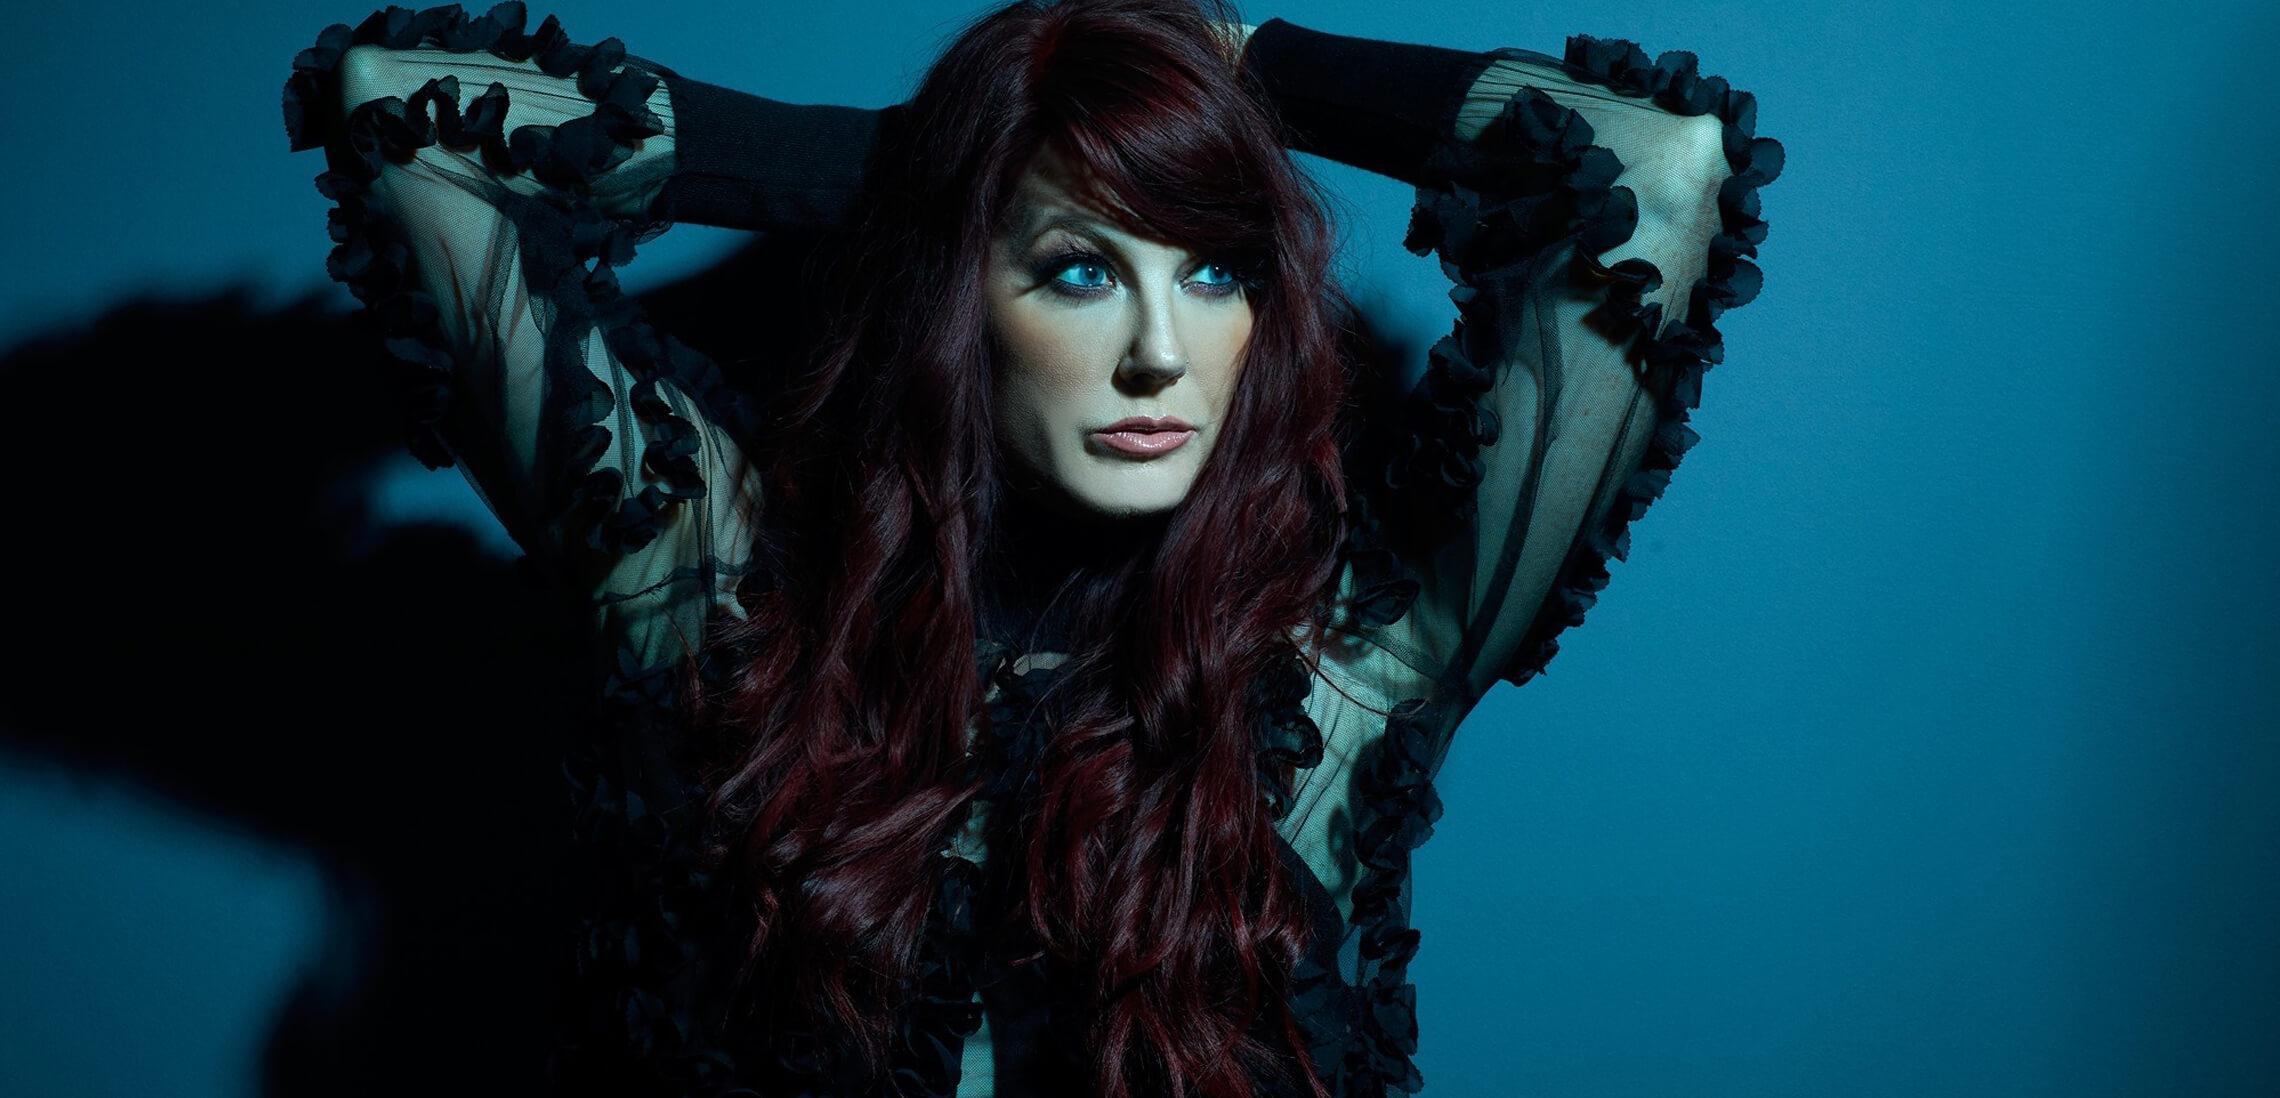 Sydney Blu & Dantiez - Waiting For You EP hero